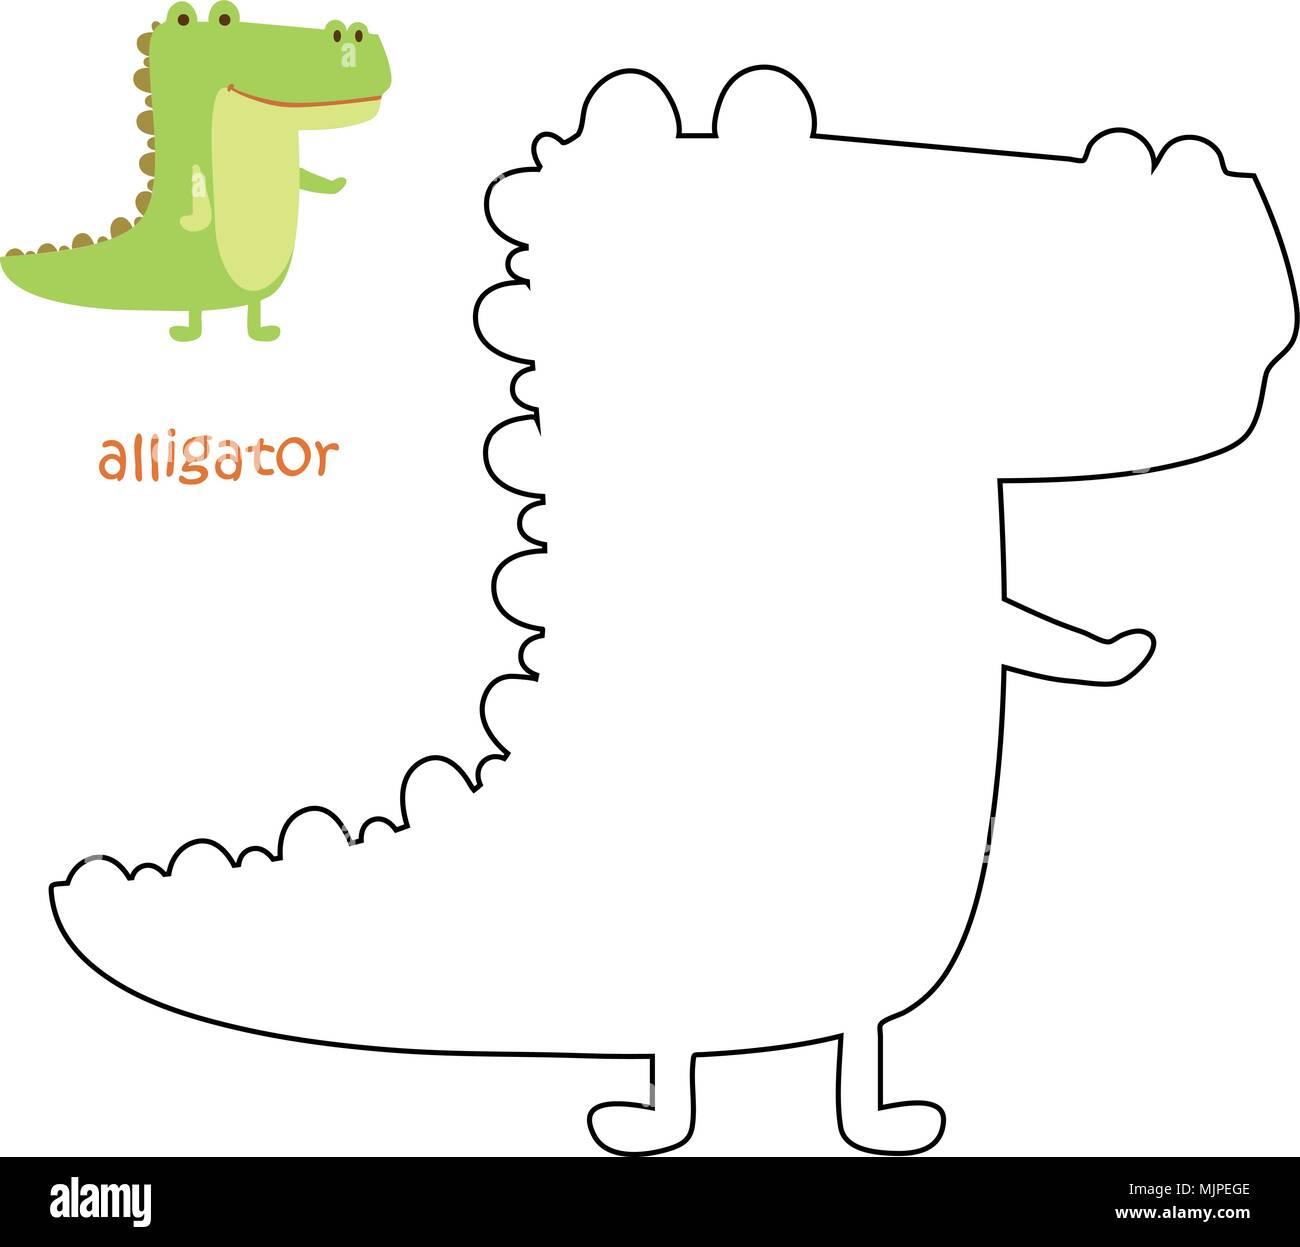 Famoso Dibujo De Allie Alligator Para Colorear Fotos - Ideas Para ...